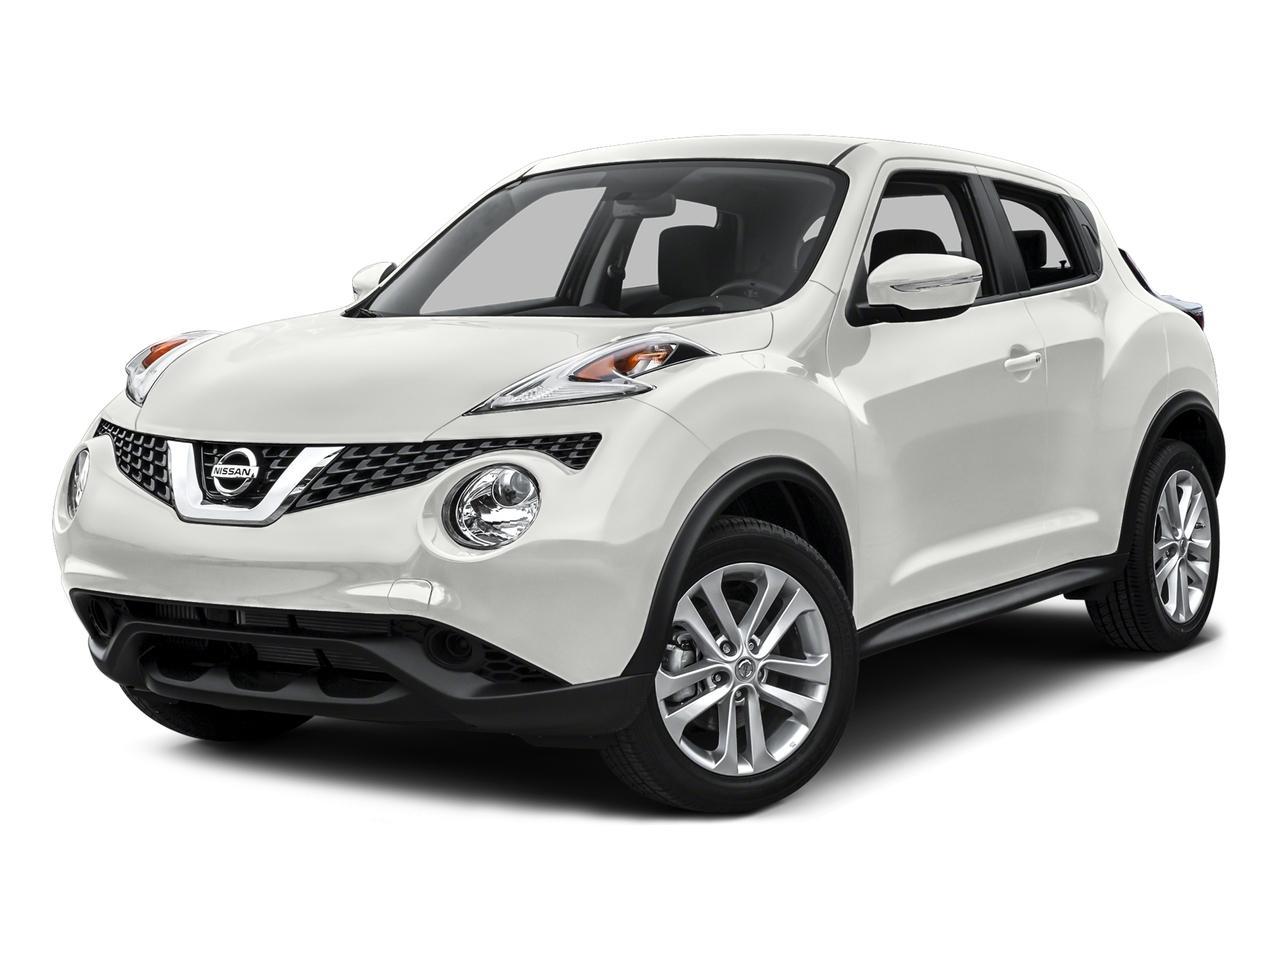 2016 Nissan JUKE Vehicle Photo in Mission, TX 78572